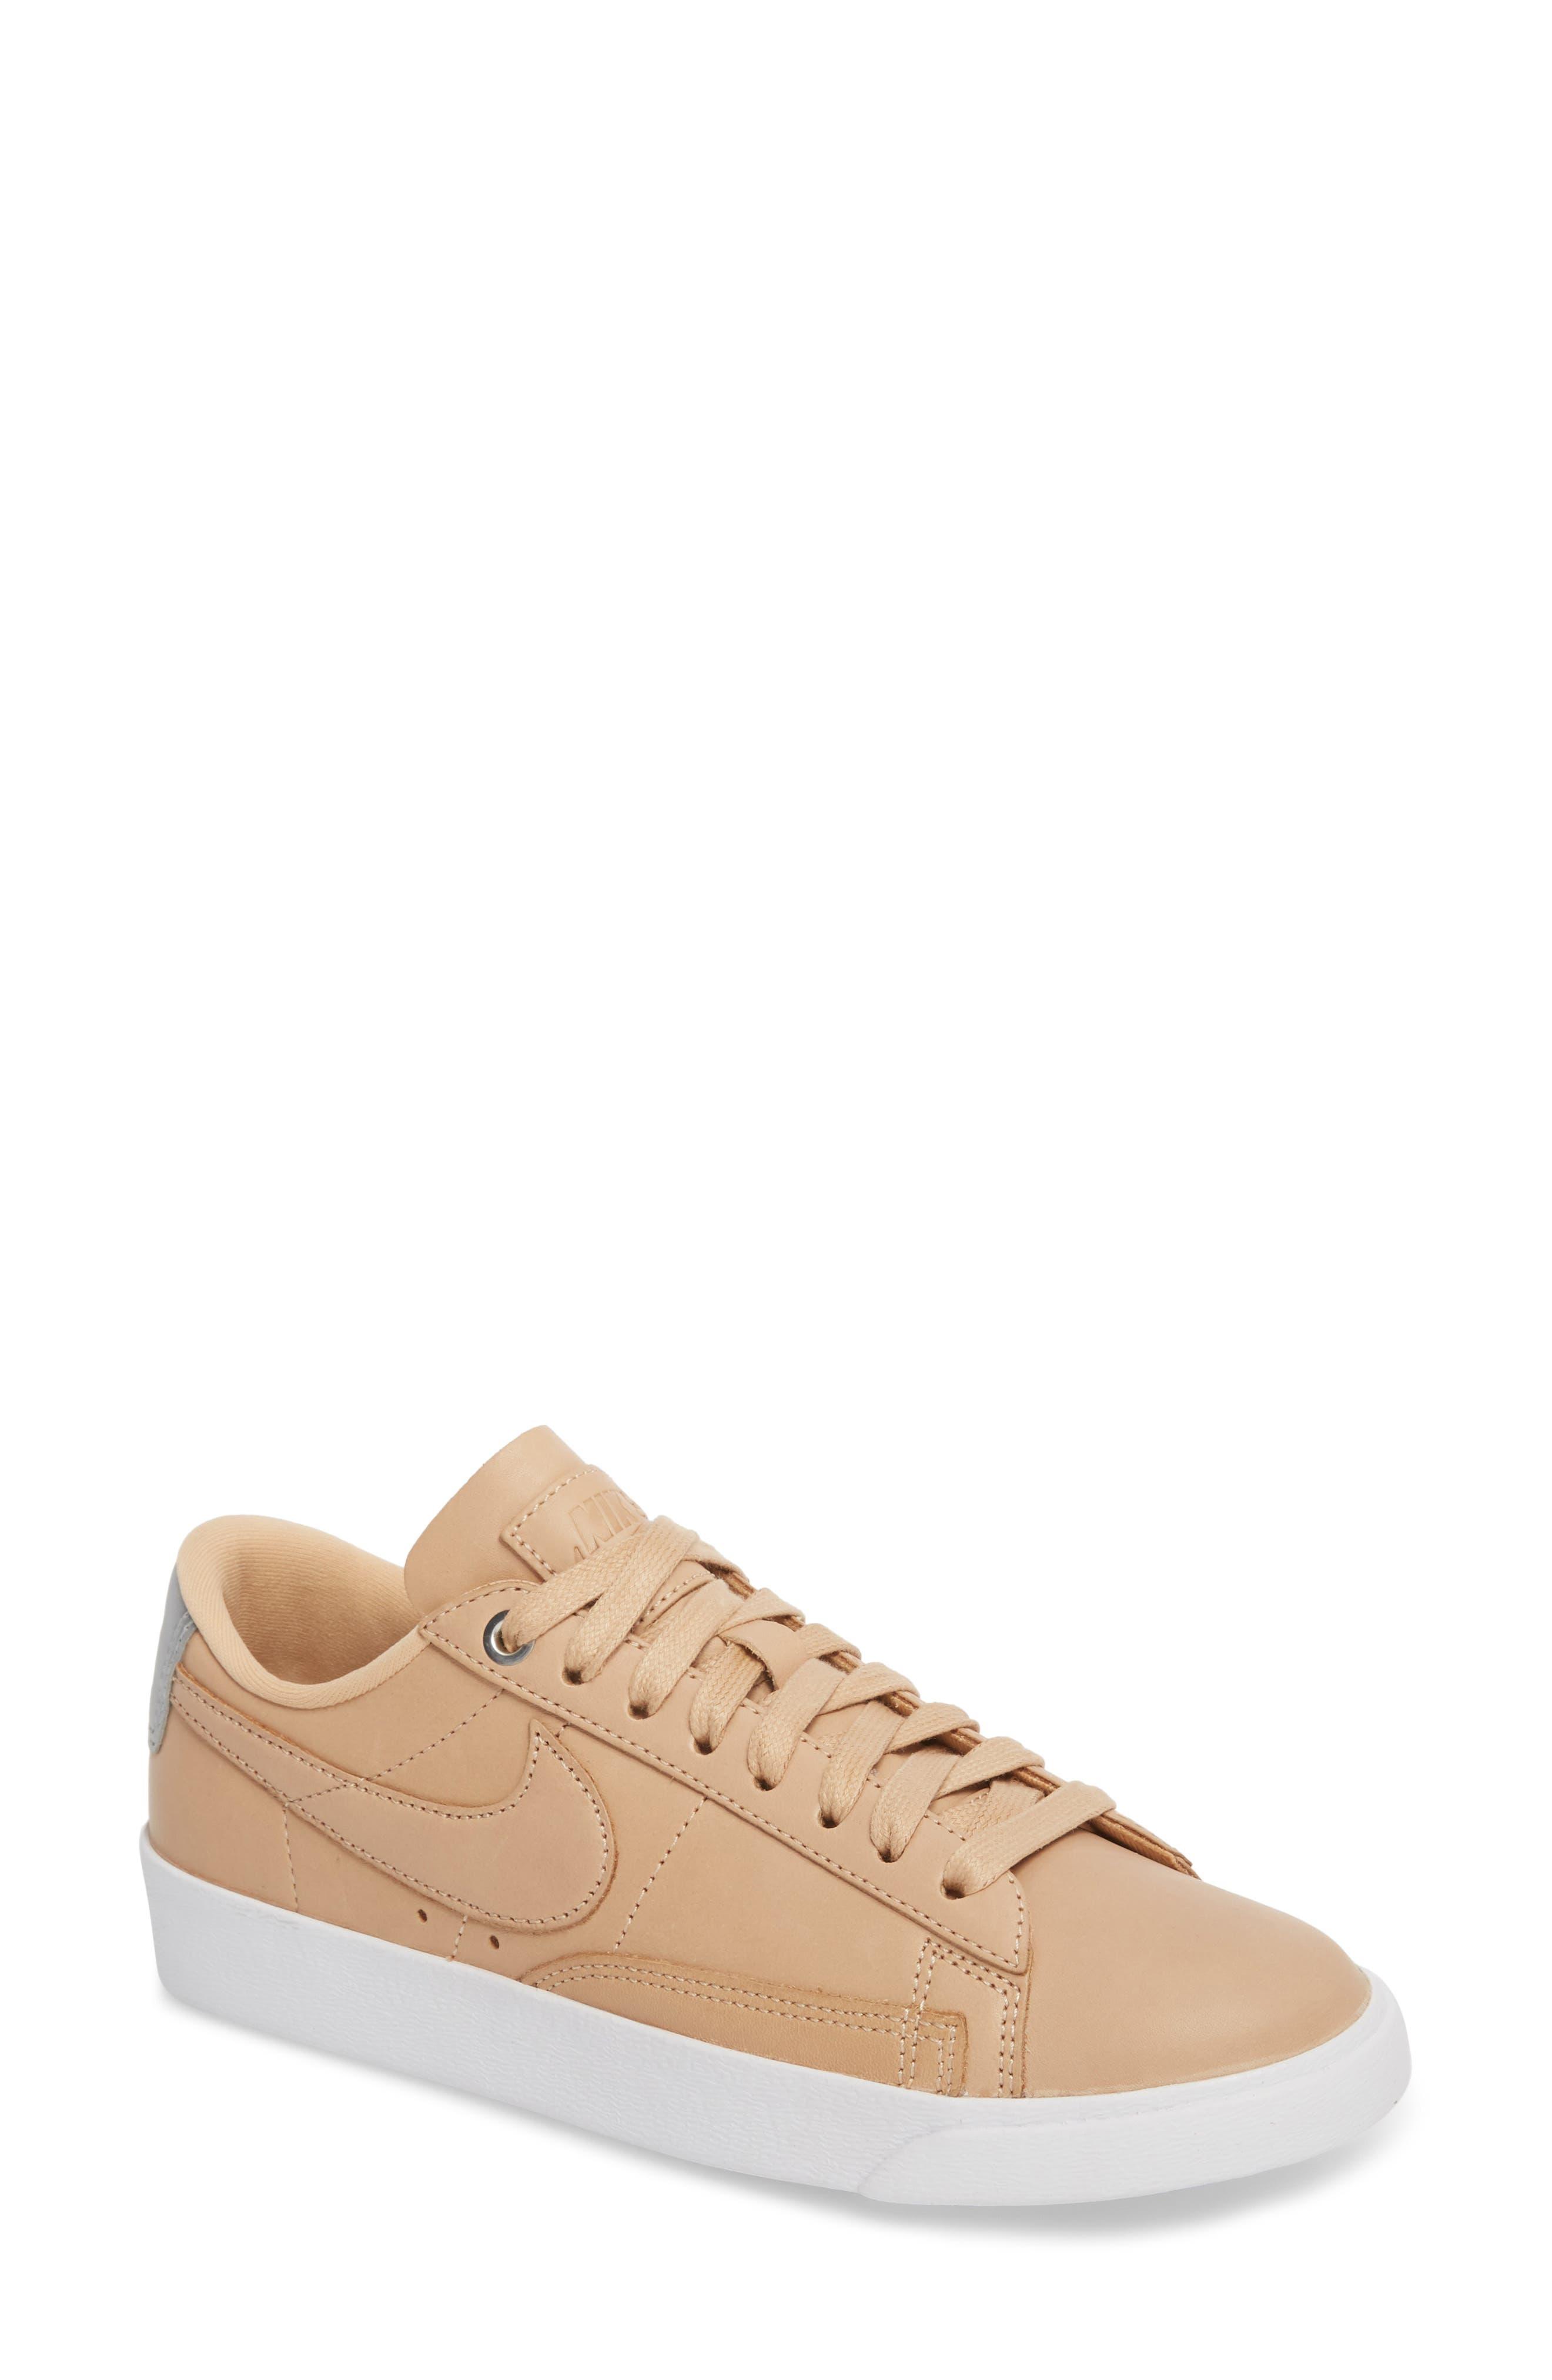 Blazer Low Top Sneaker SE,                         Main,                         color, BIO BEIGE/ BIO BEIGE